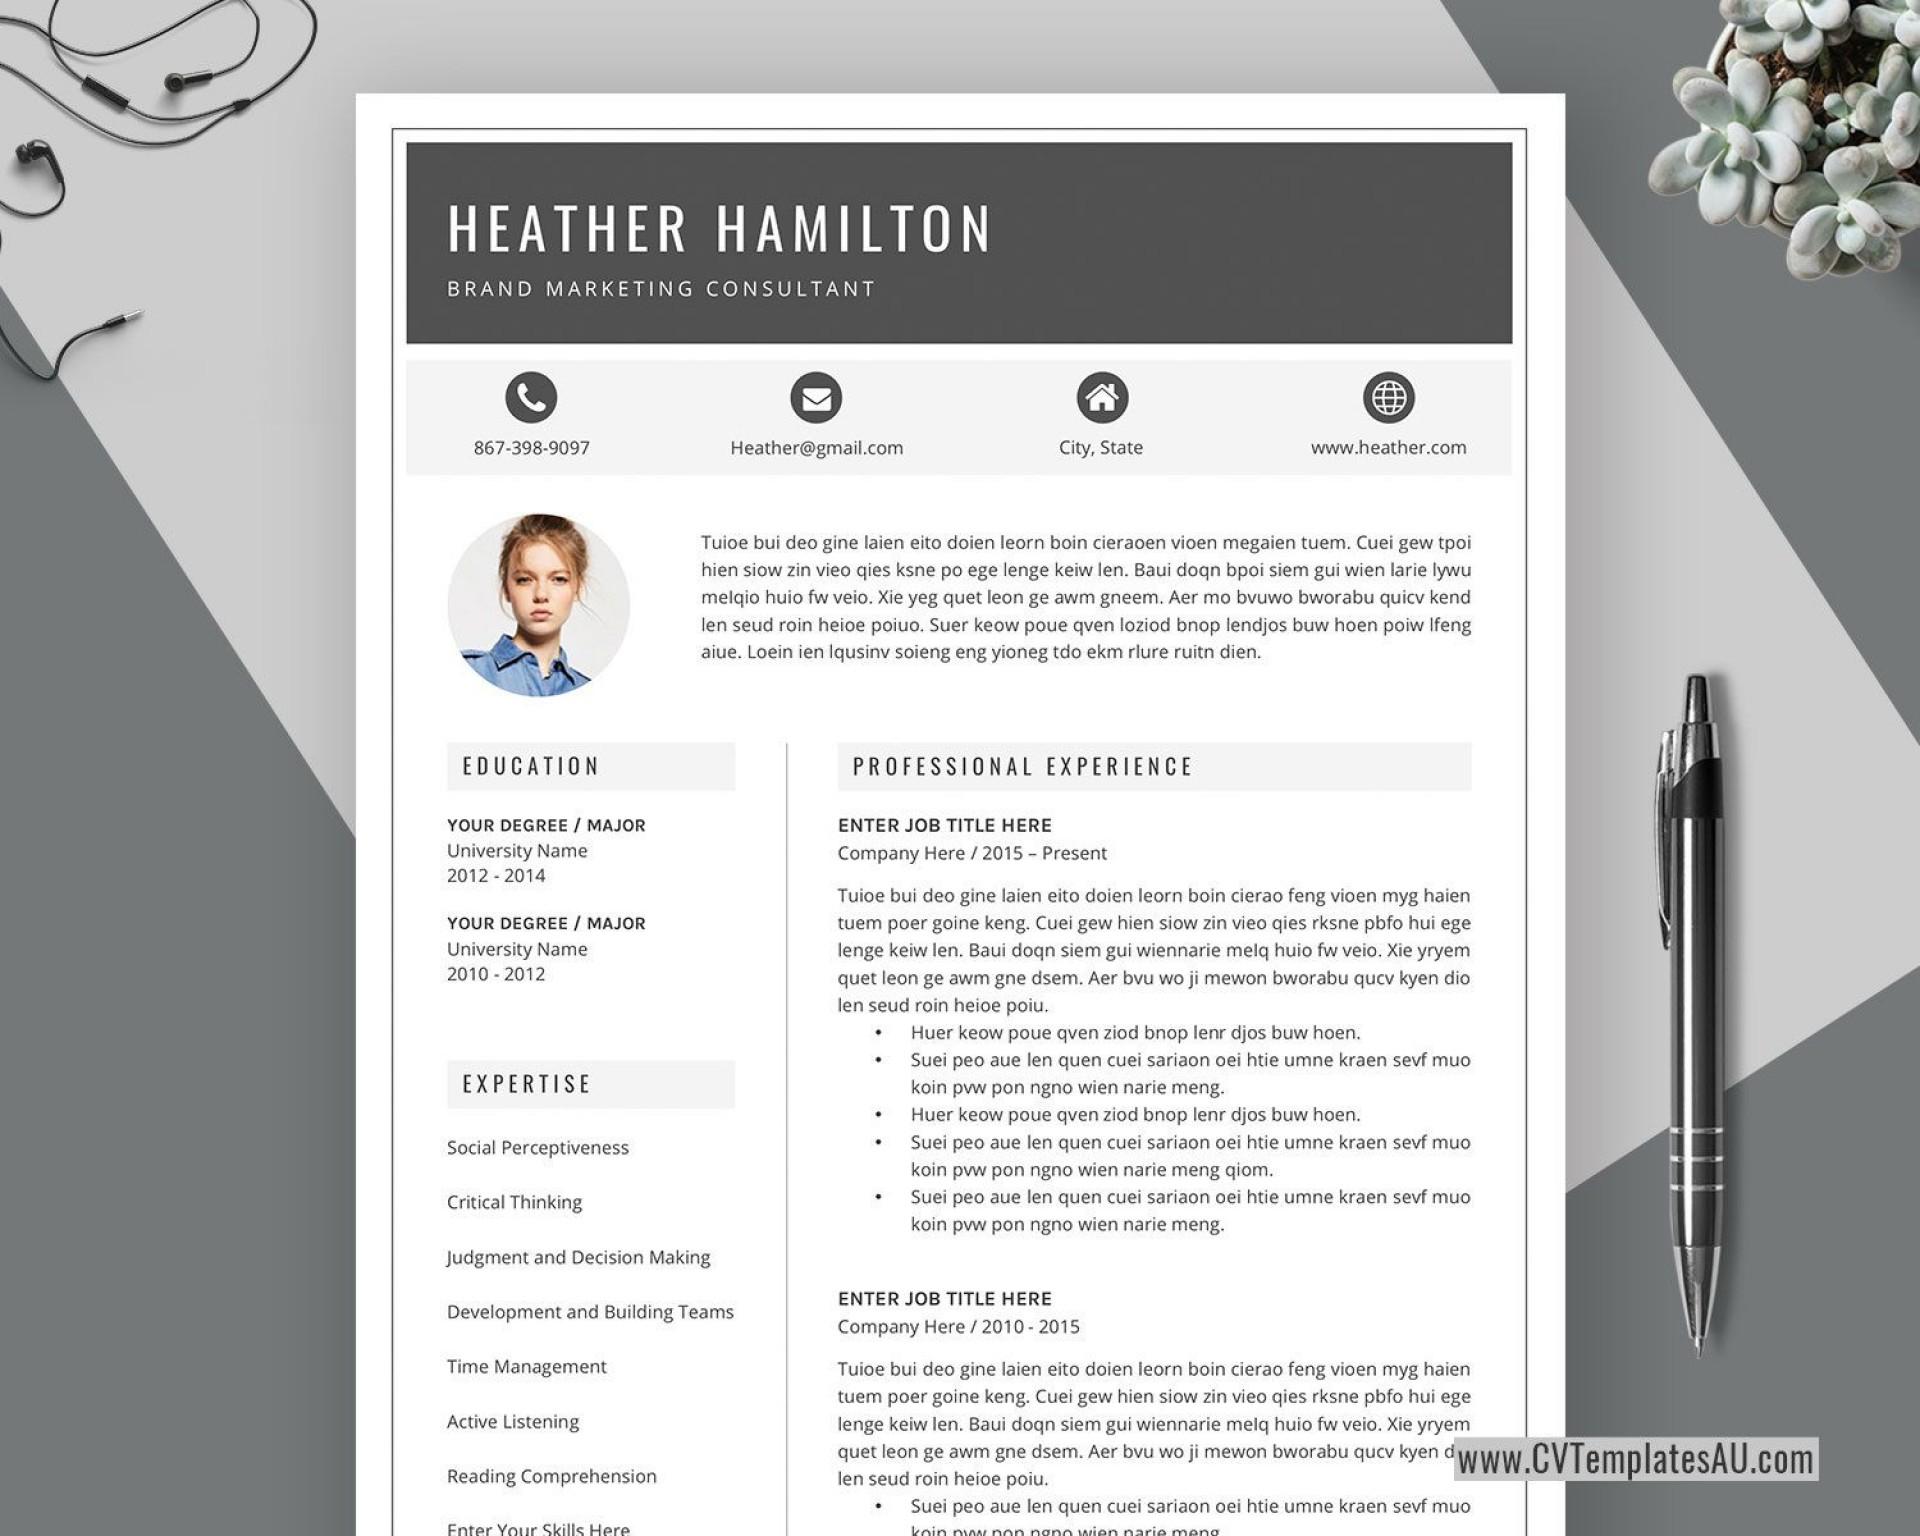 003 Imposing Microsoft Word Template Download Photo  2010 Resume Free 2007 Error Invoice1920